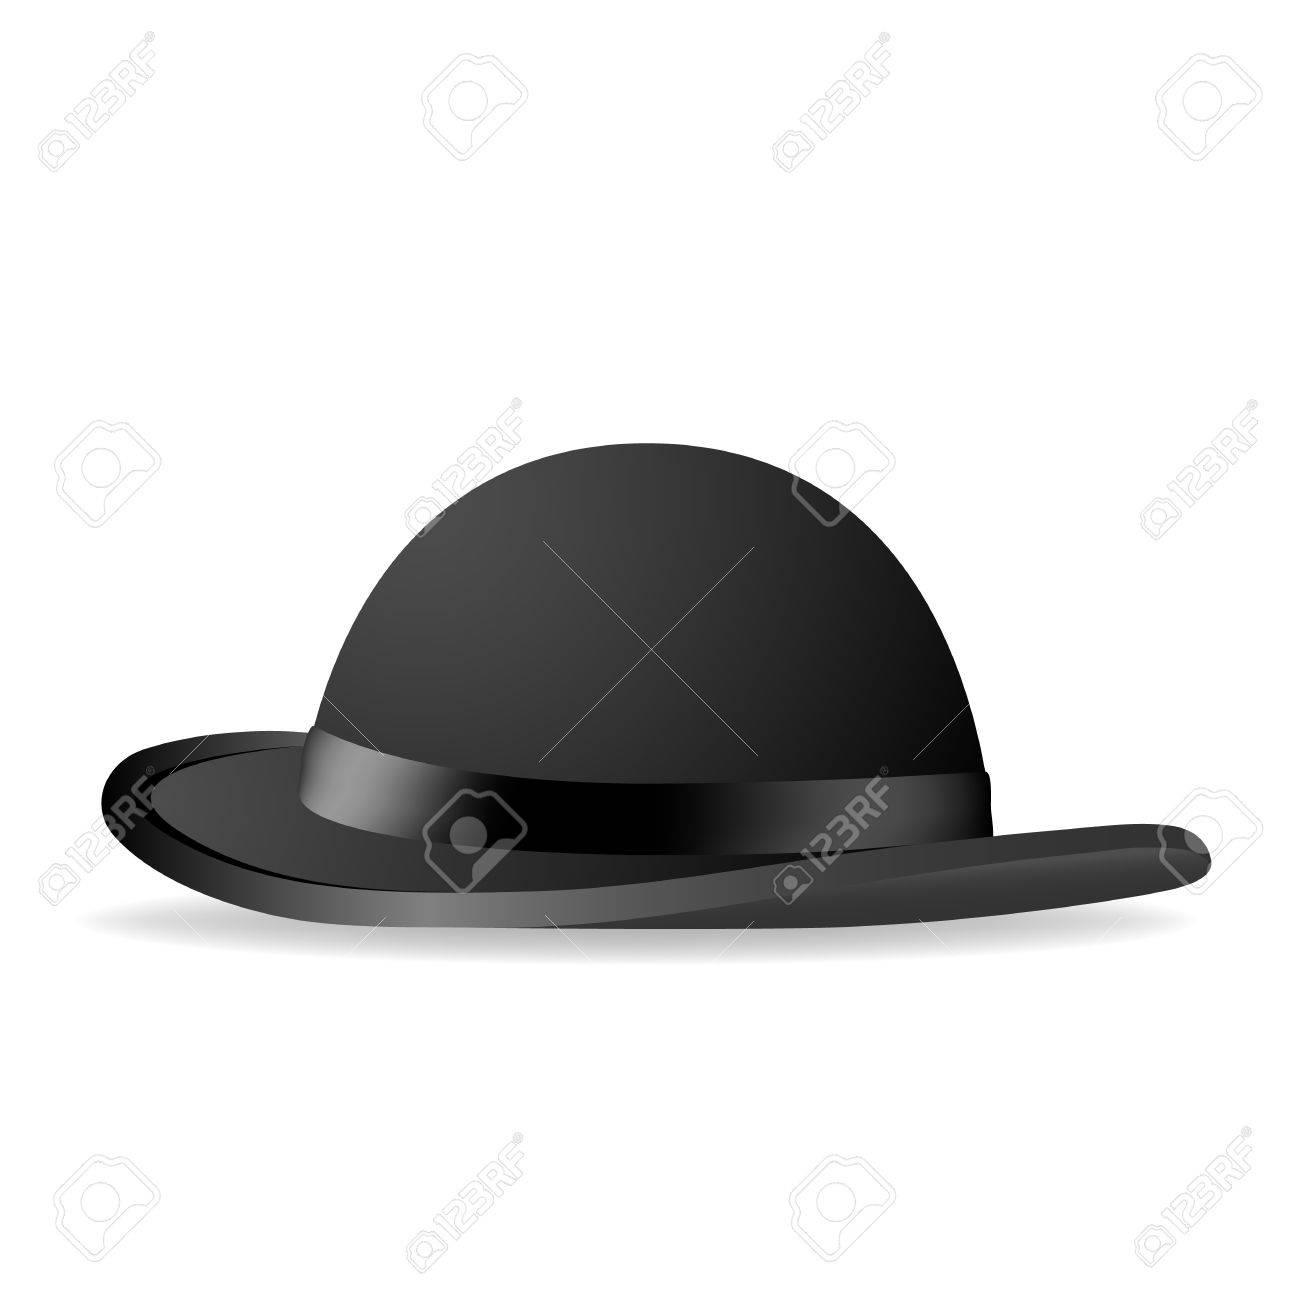 185a307e2bb04 Black bowler hat Vector illustration Stock Vector - 21823445